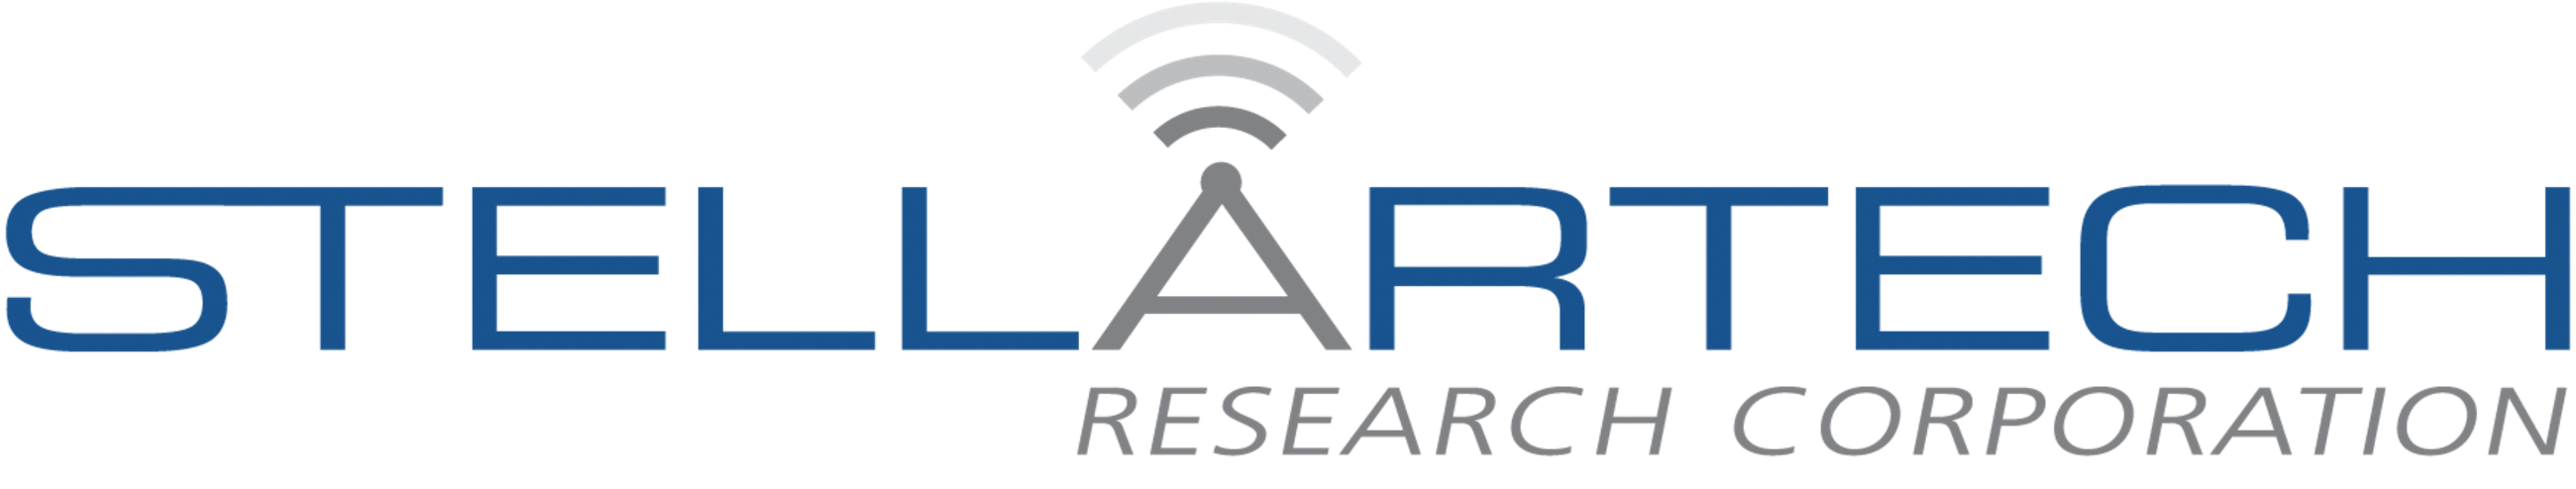 Stellartech Research company logo